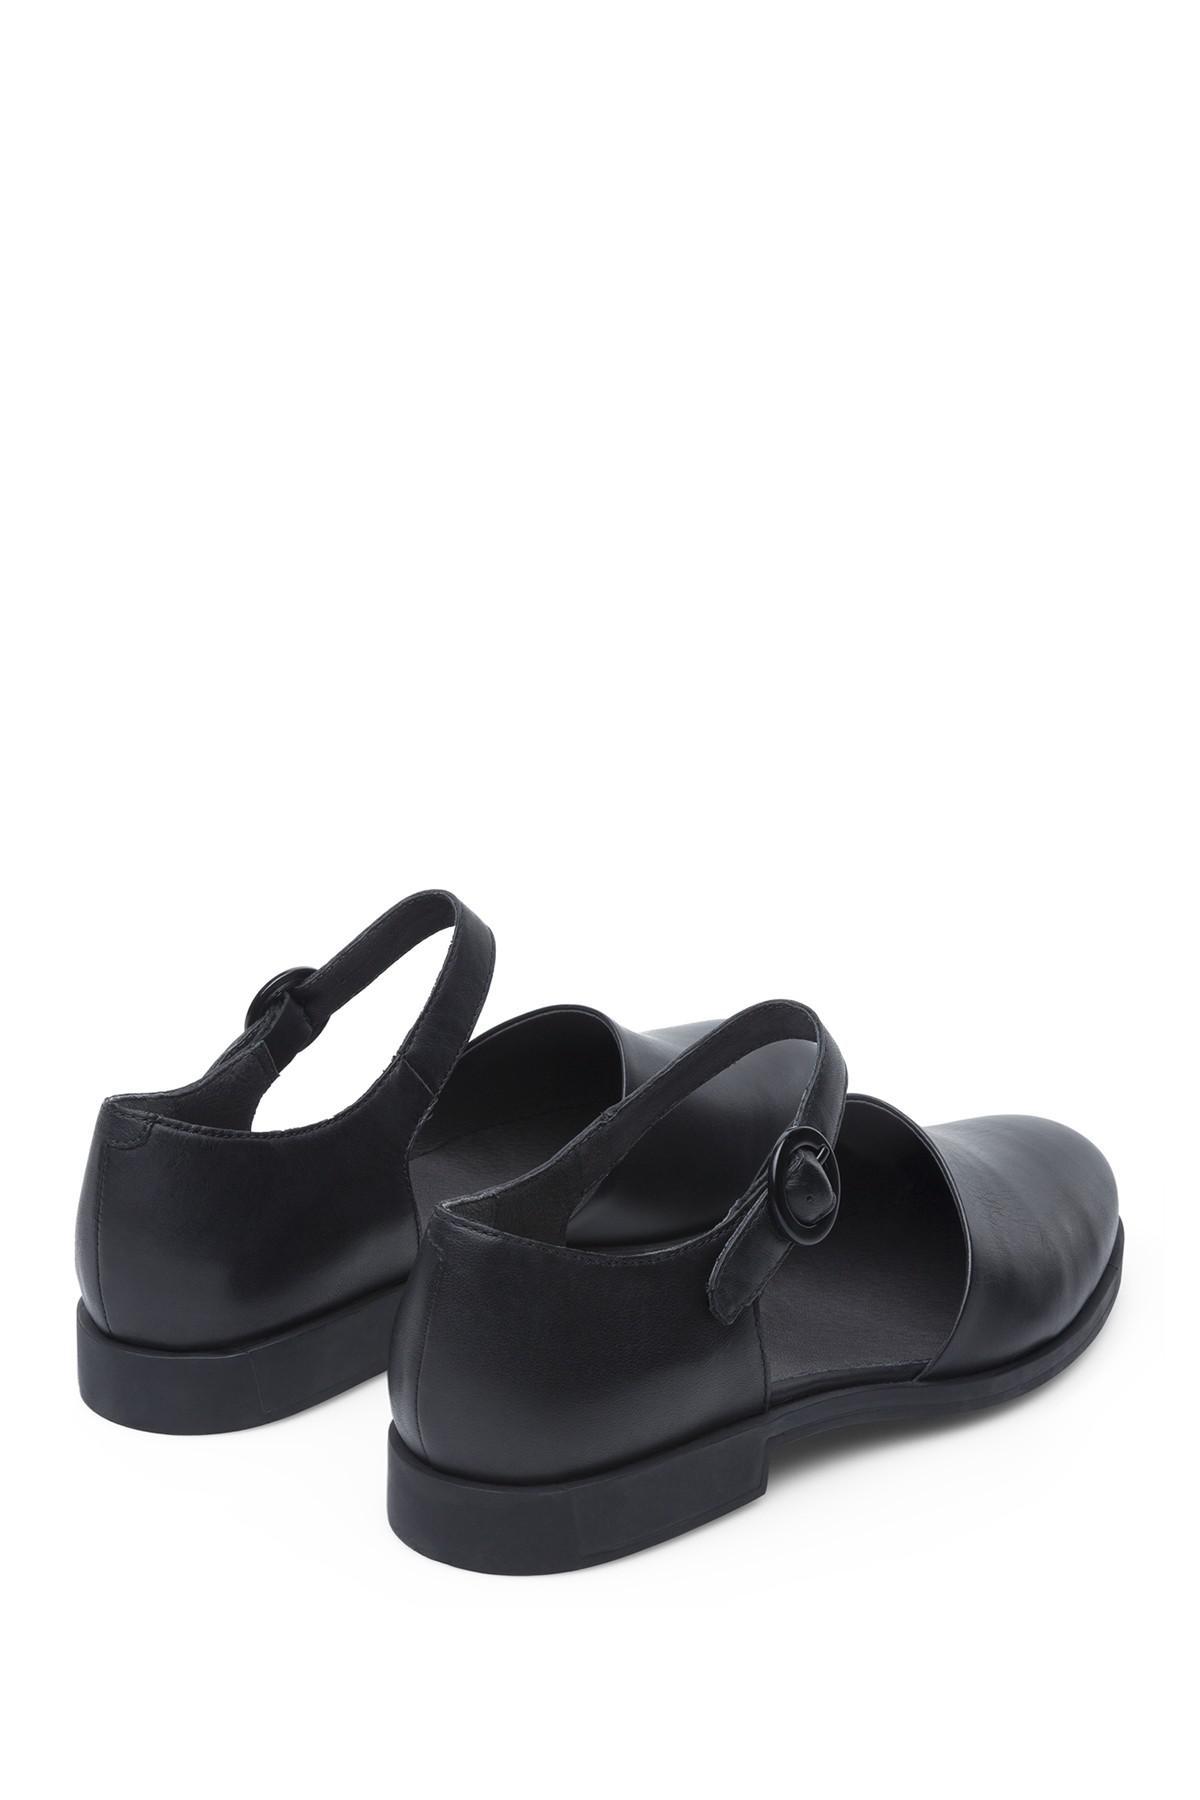 903d8b7debb Camper - Black Bowie Ankle Strap Loafer - Lyst. View fullscreen